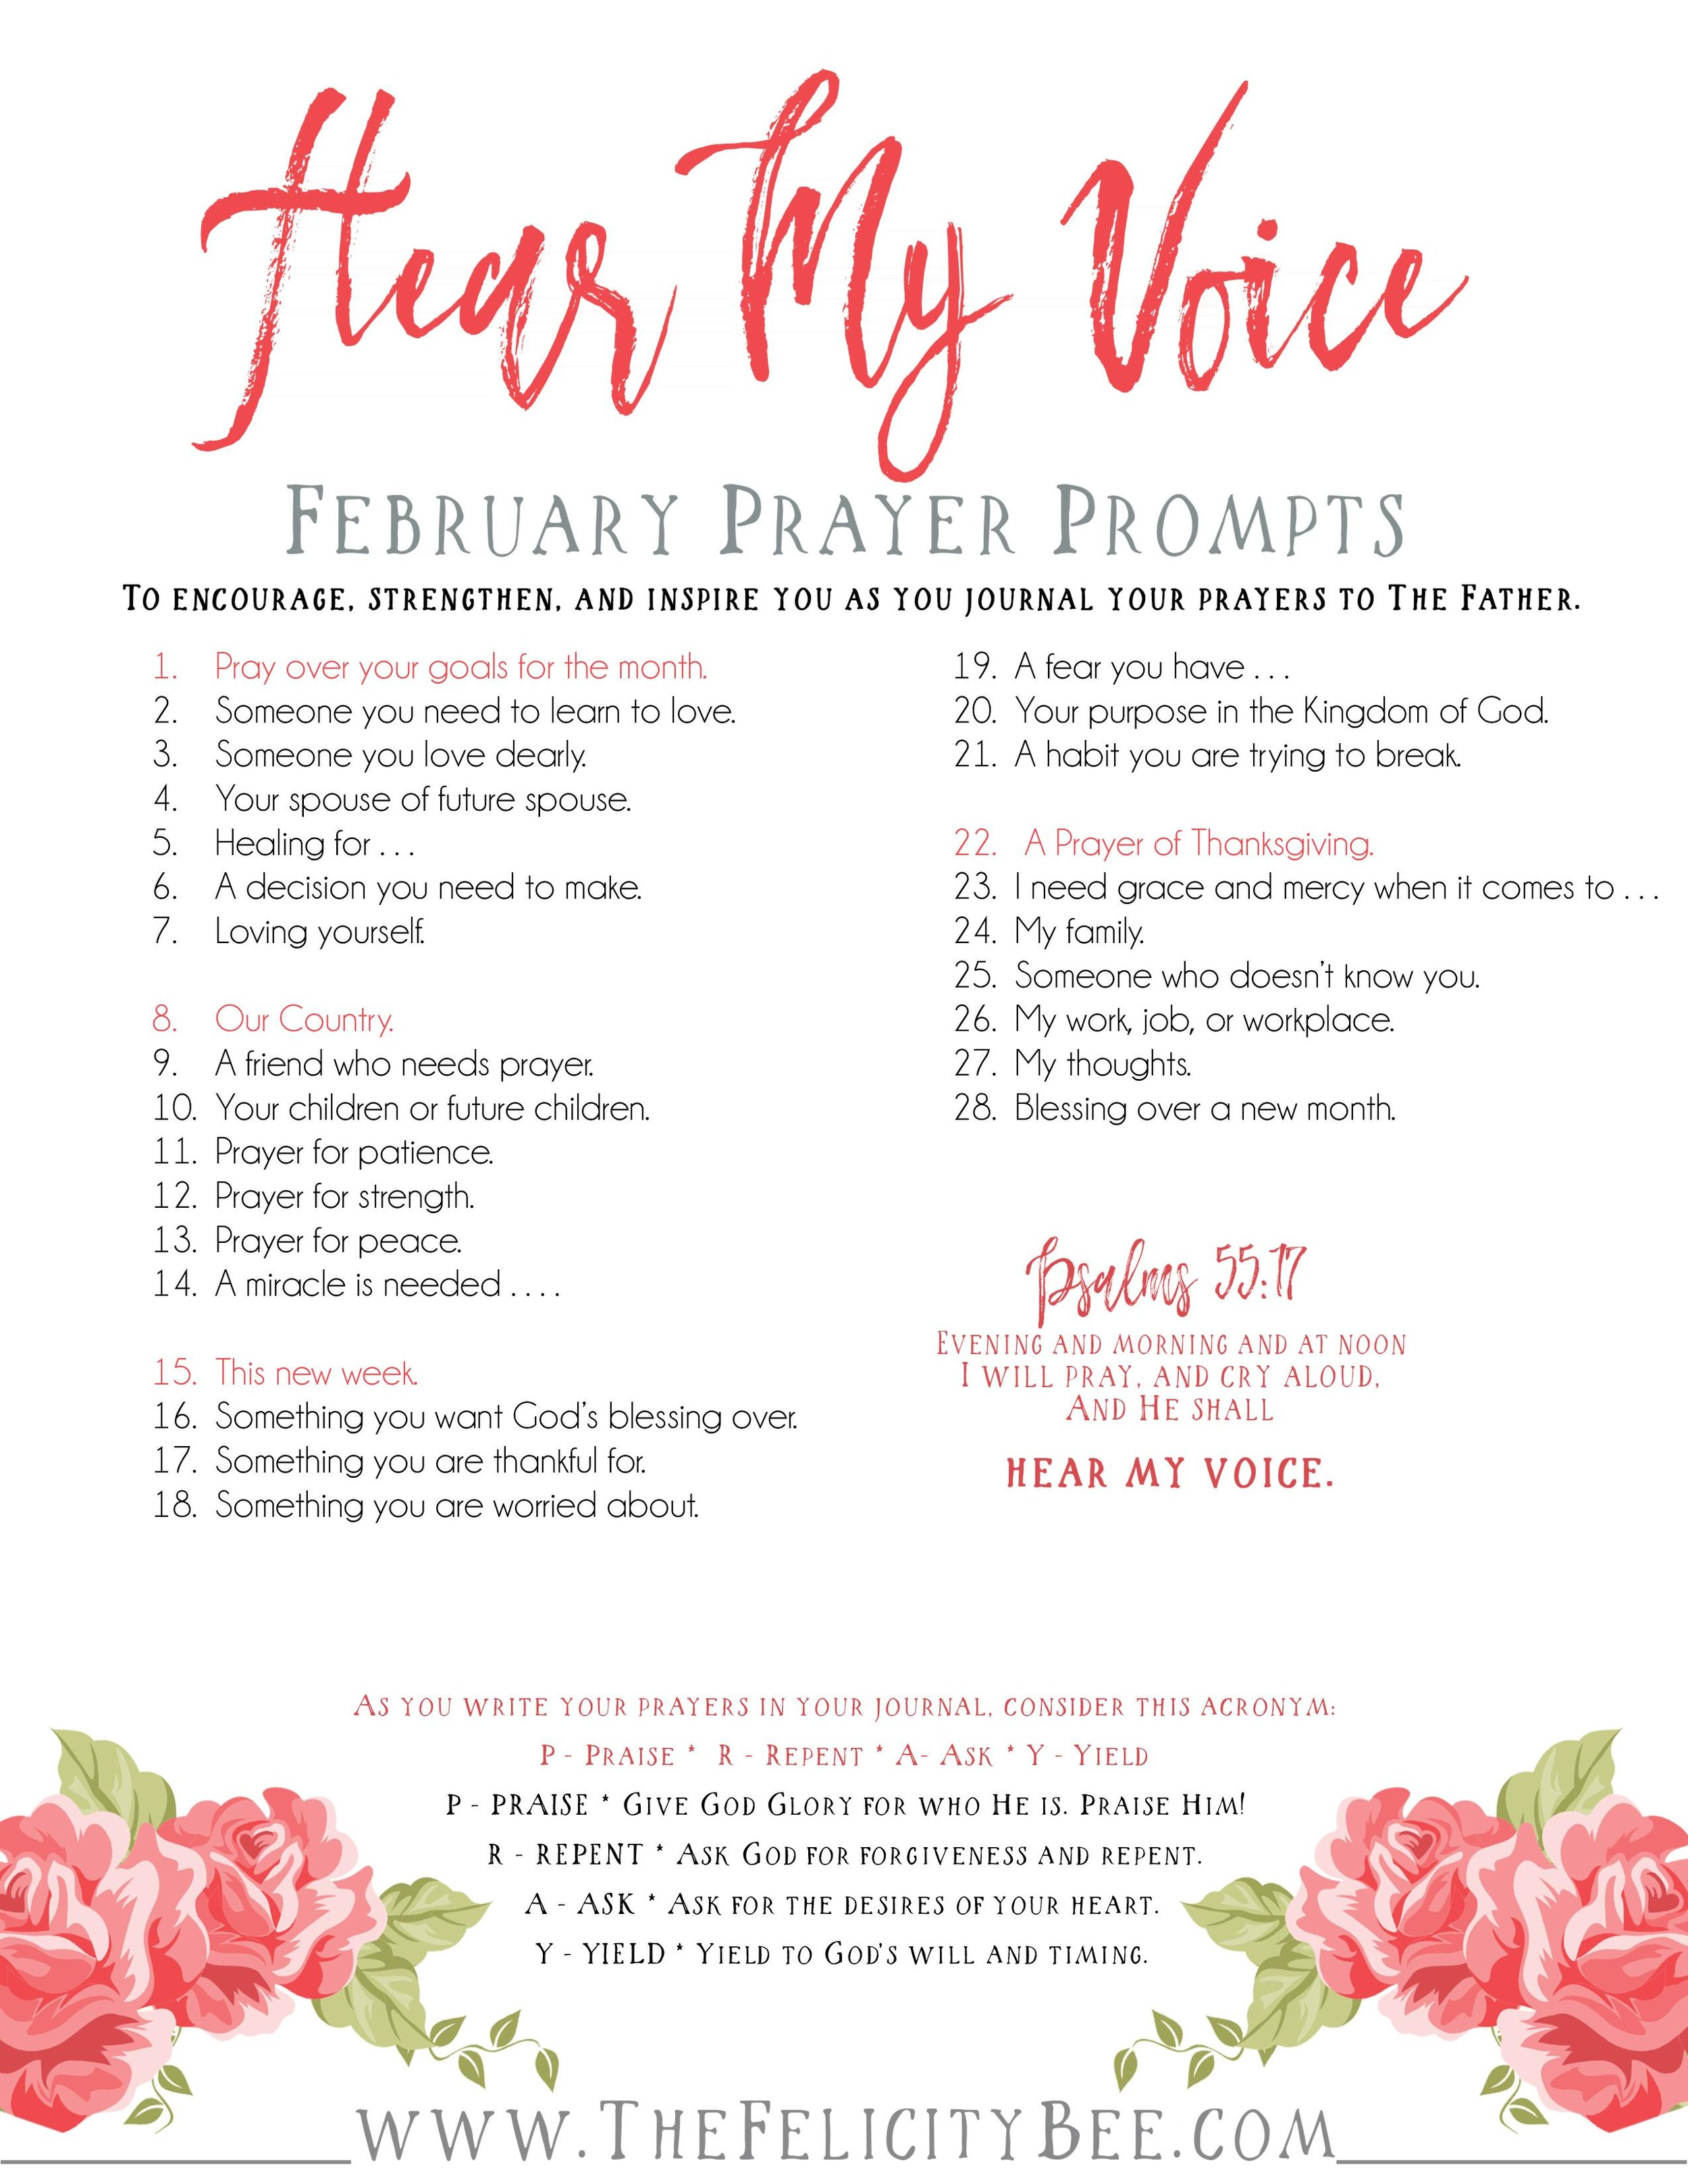 Hear My Voice       February Prayer Prompts  — Symphony of